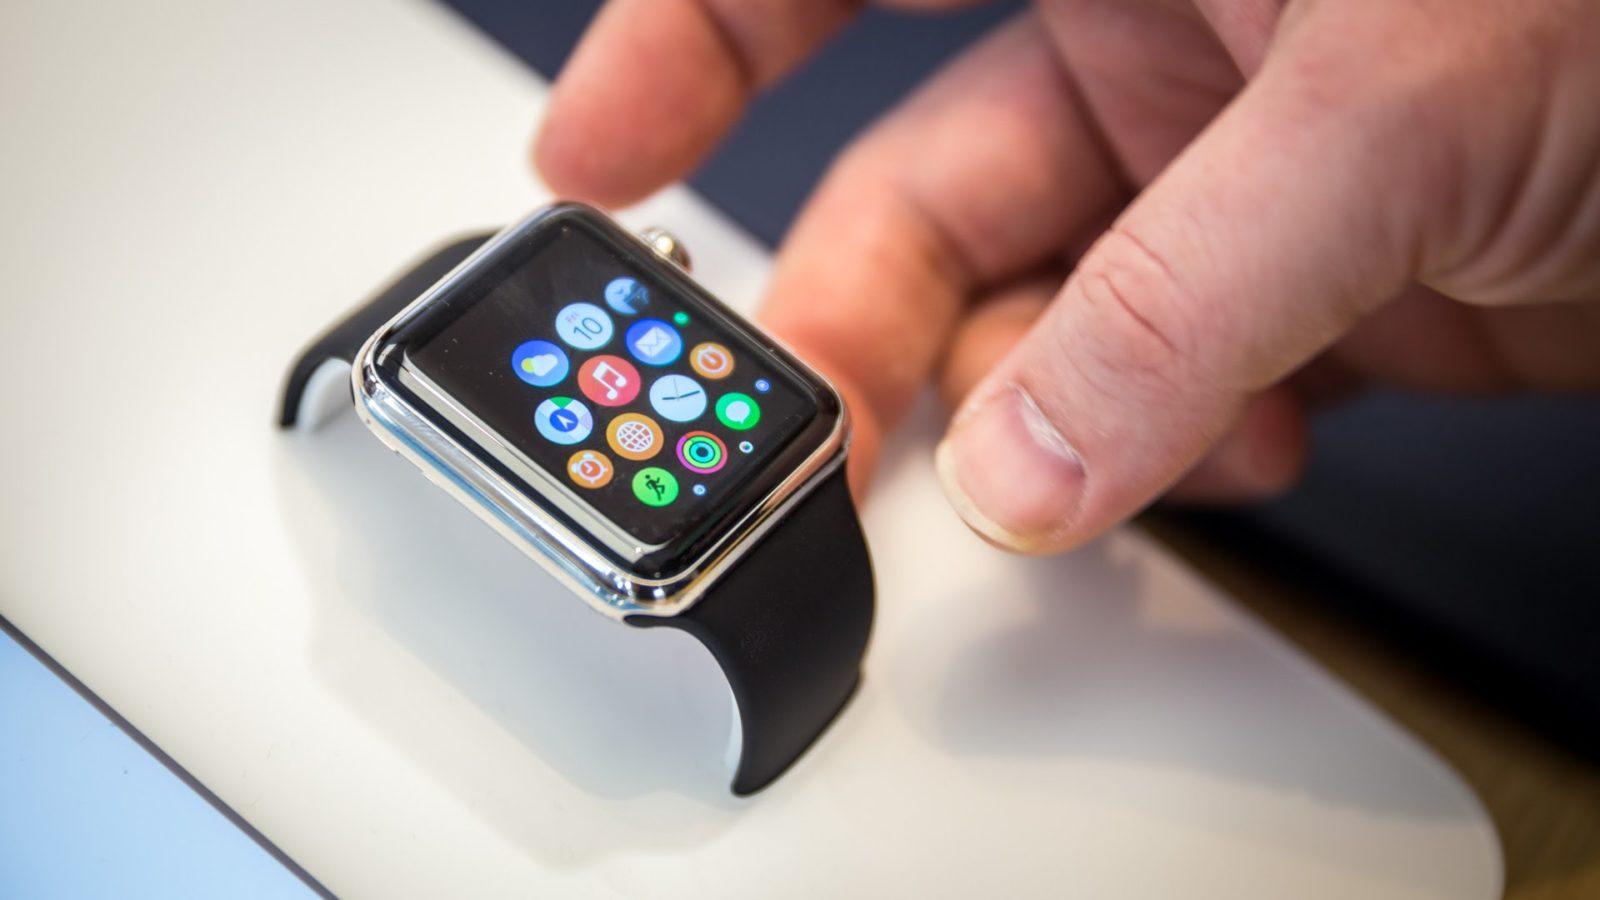 Apple marketing demo